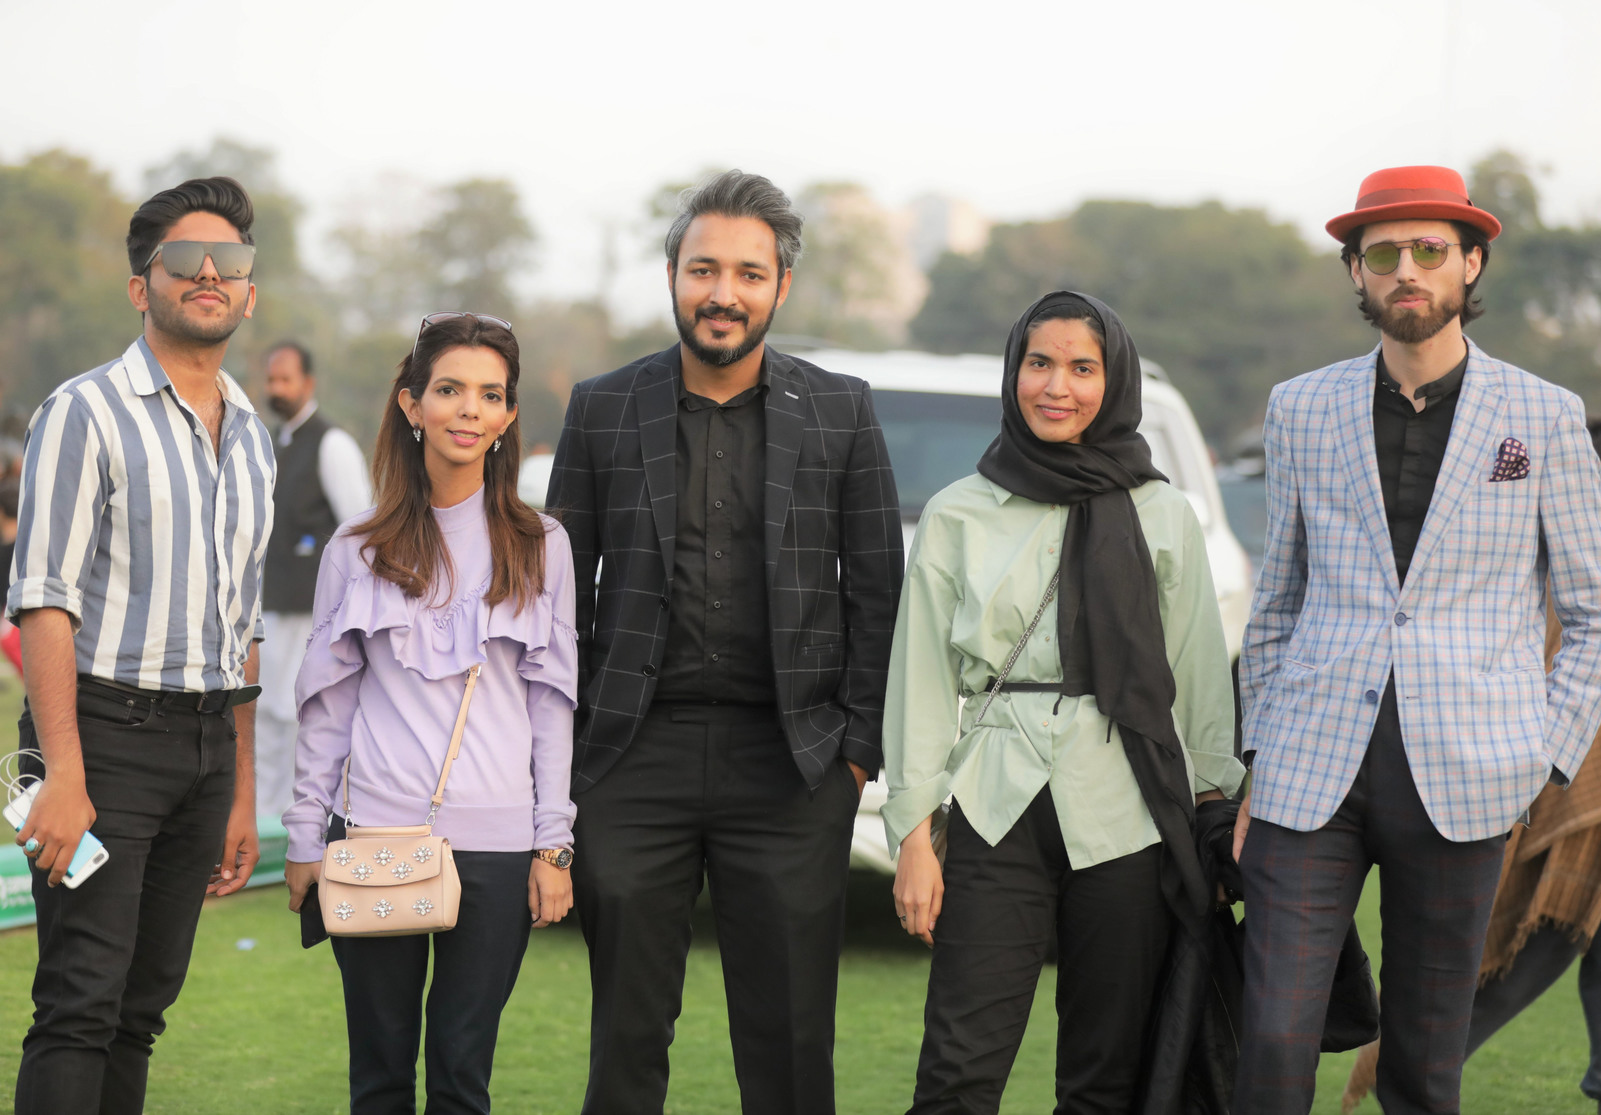 Ghazi Khan, Shireen Rehman, Amjad Bhatti, Shazia Rehman, Bilal Dar (1)